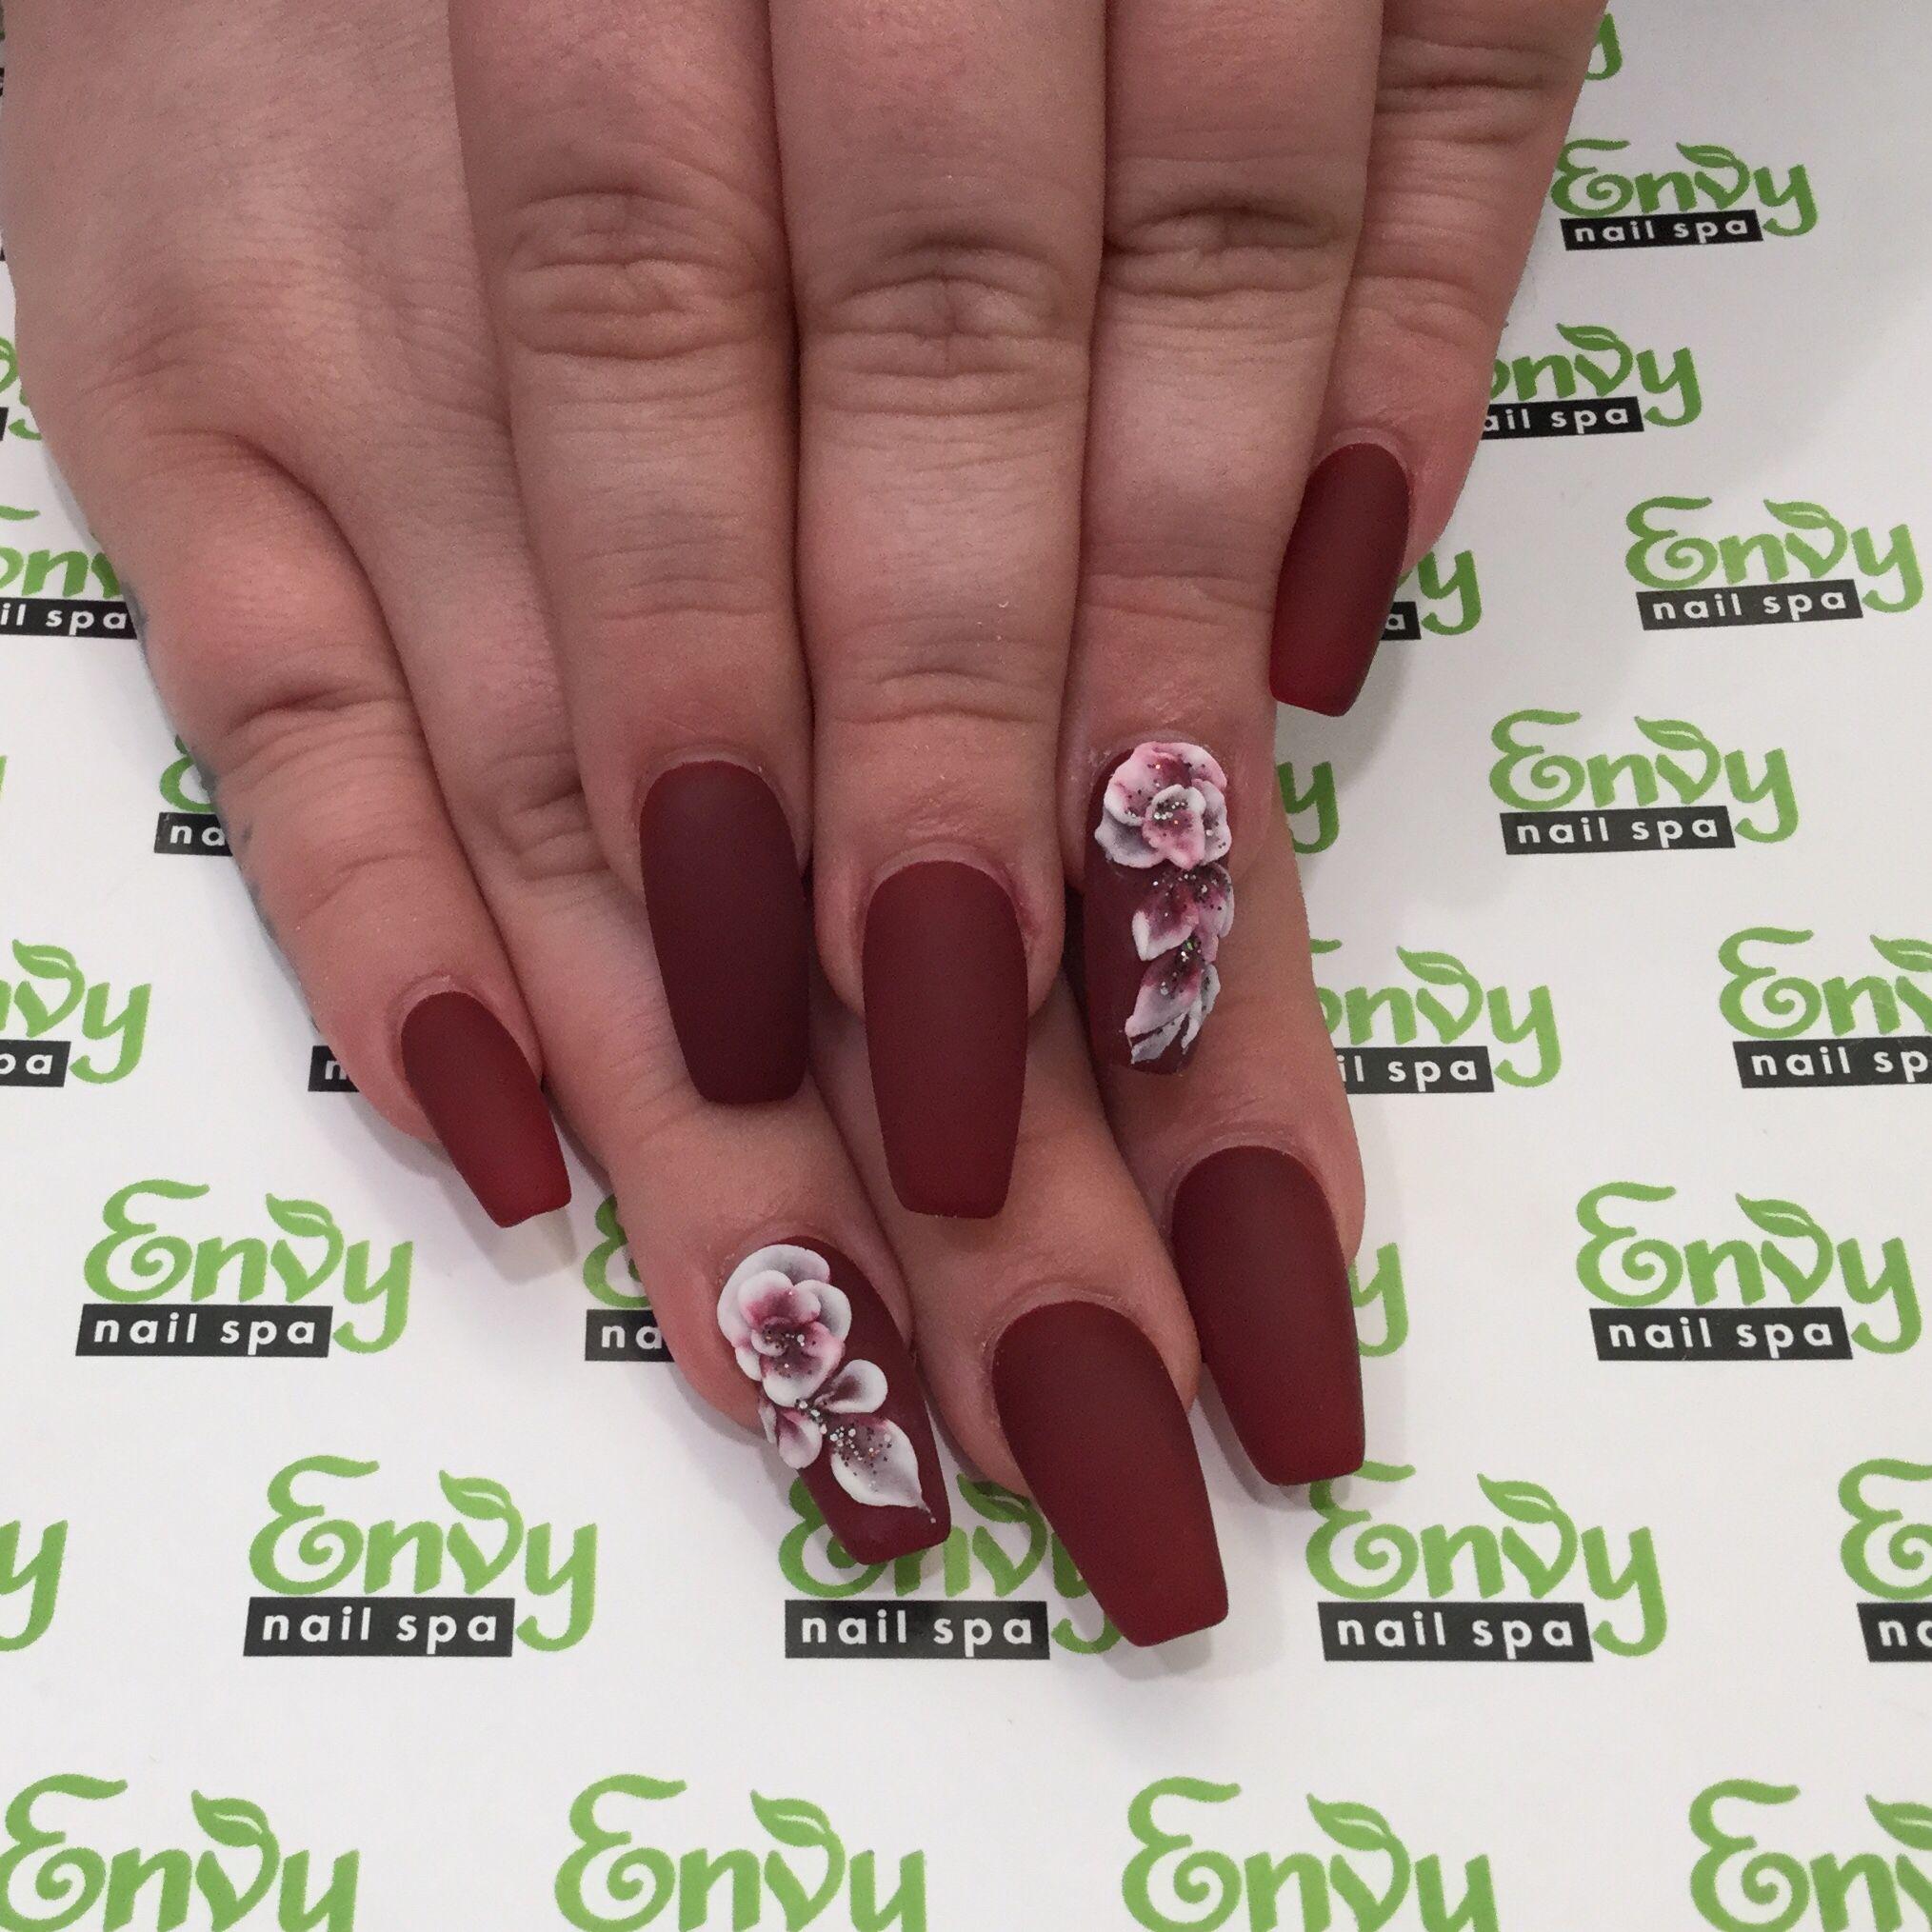 Envy Nail Spa At Your Finger Tips Bride Nails 3d Flower Nails Burgundy Nails